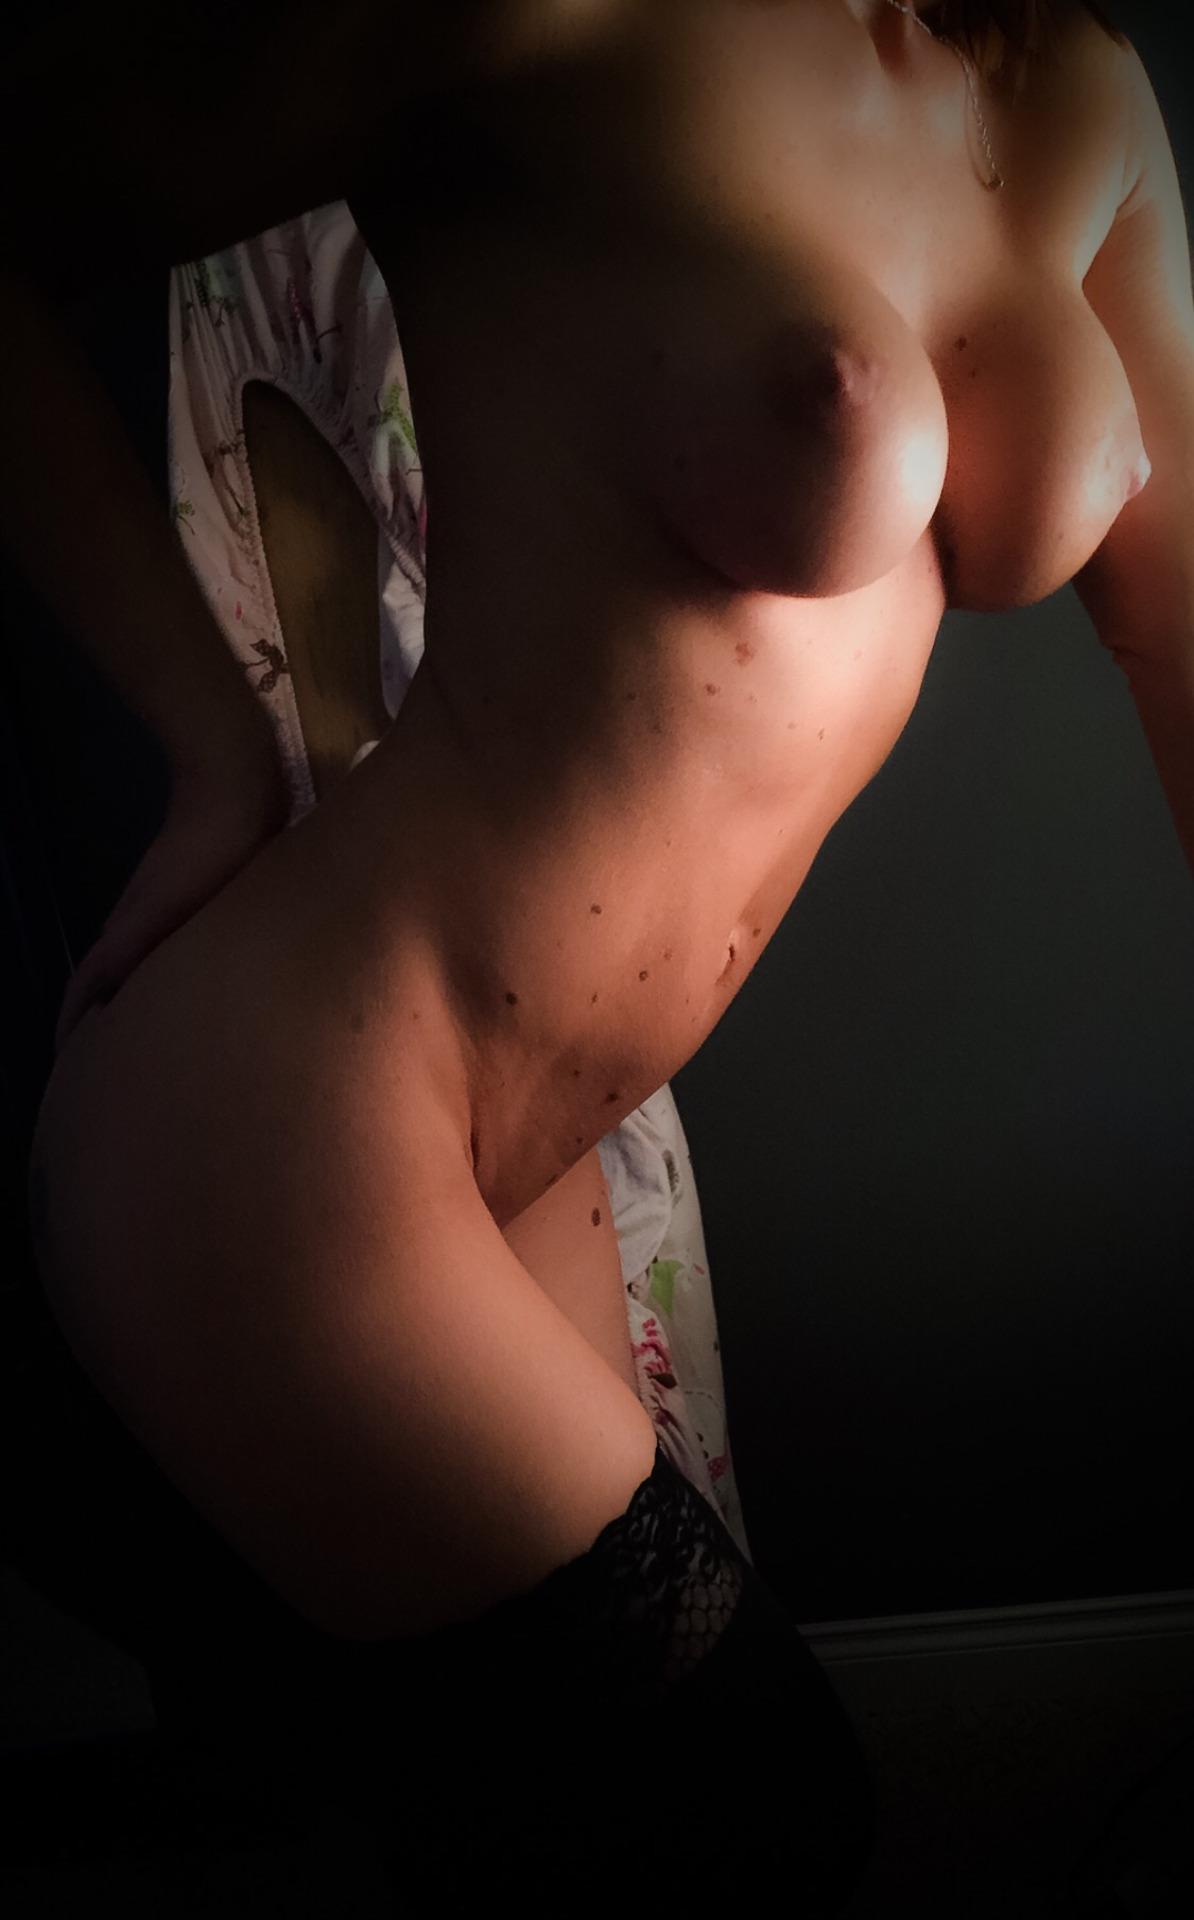 selfie coquin de fille sexy du 77 en manque